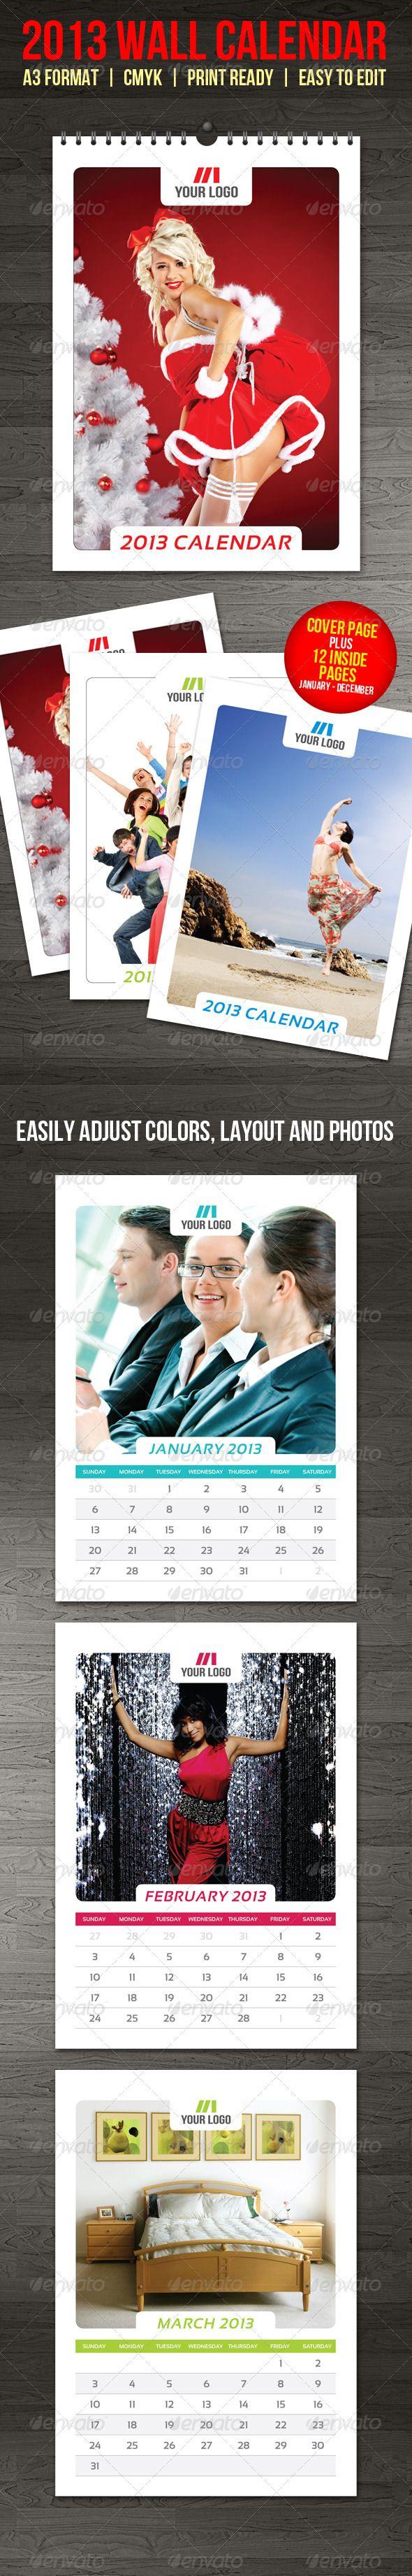 94 best Print Templates images on Pinterest | Print templates, Font ...